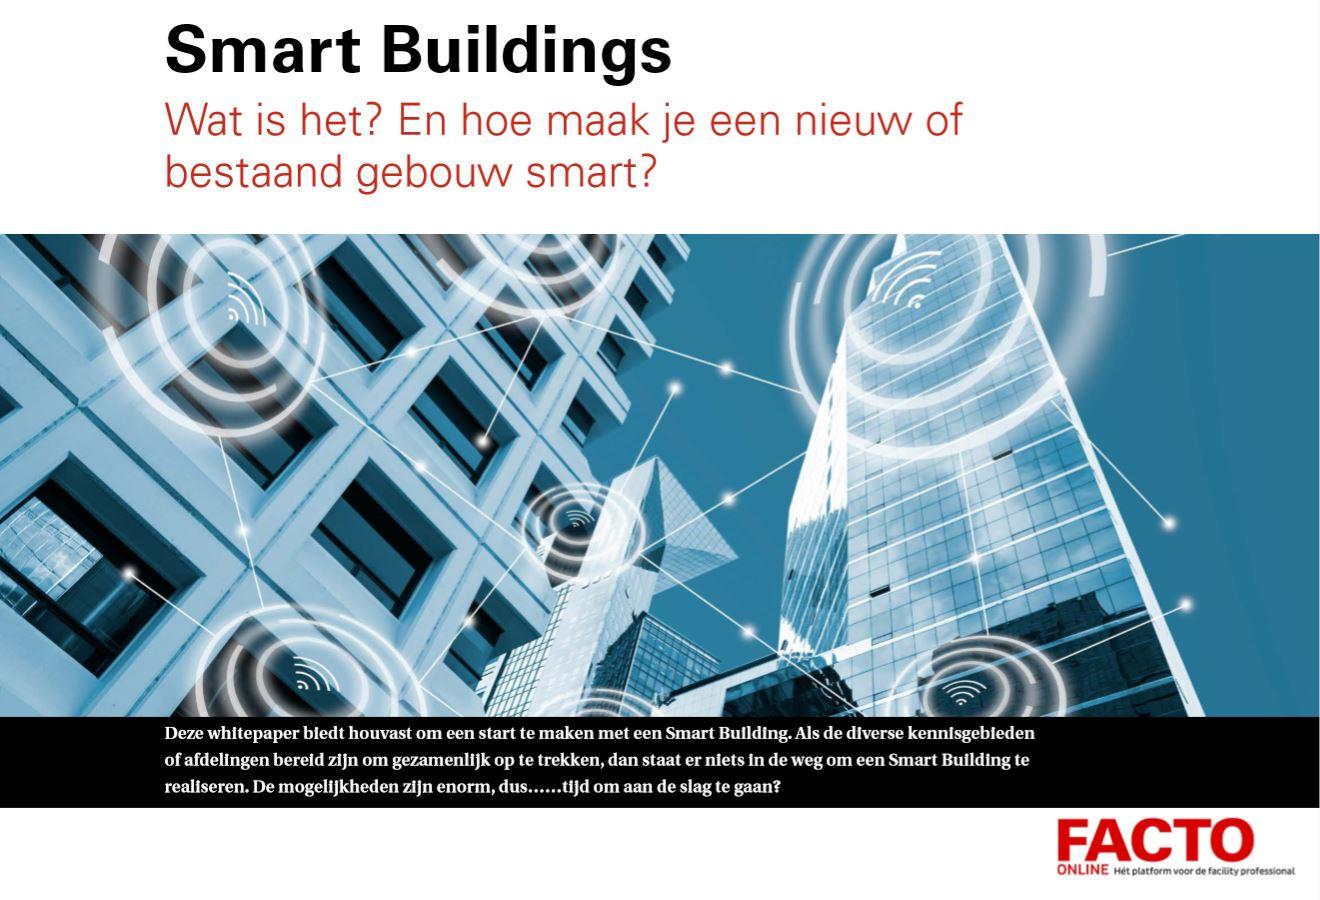 Facto whitepaper Smart Buildings